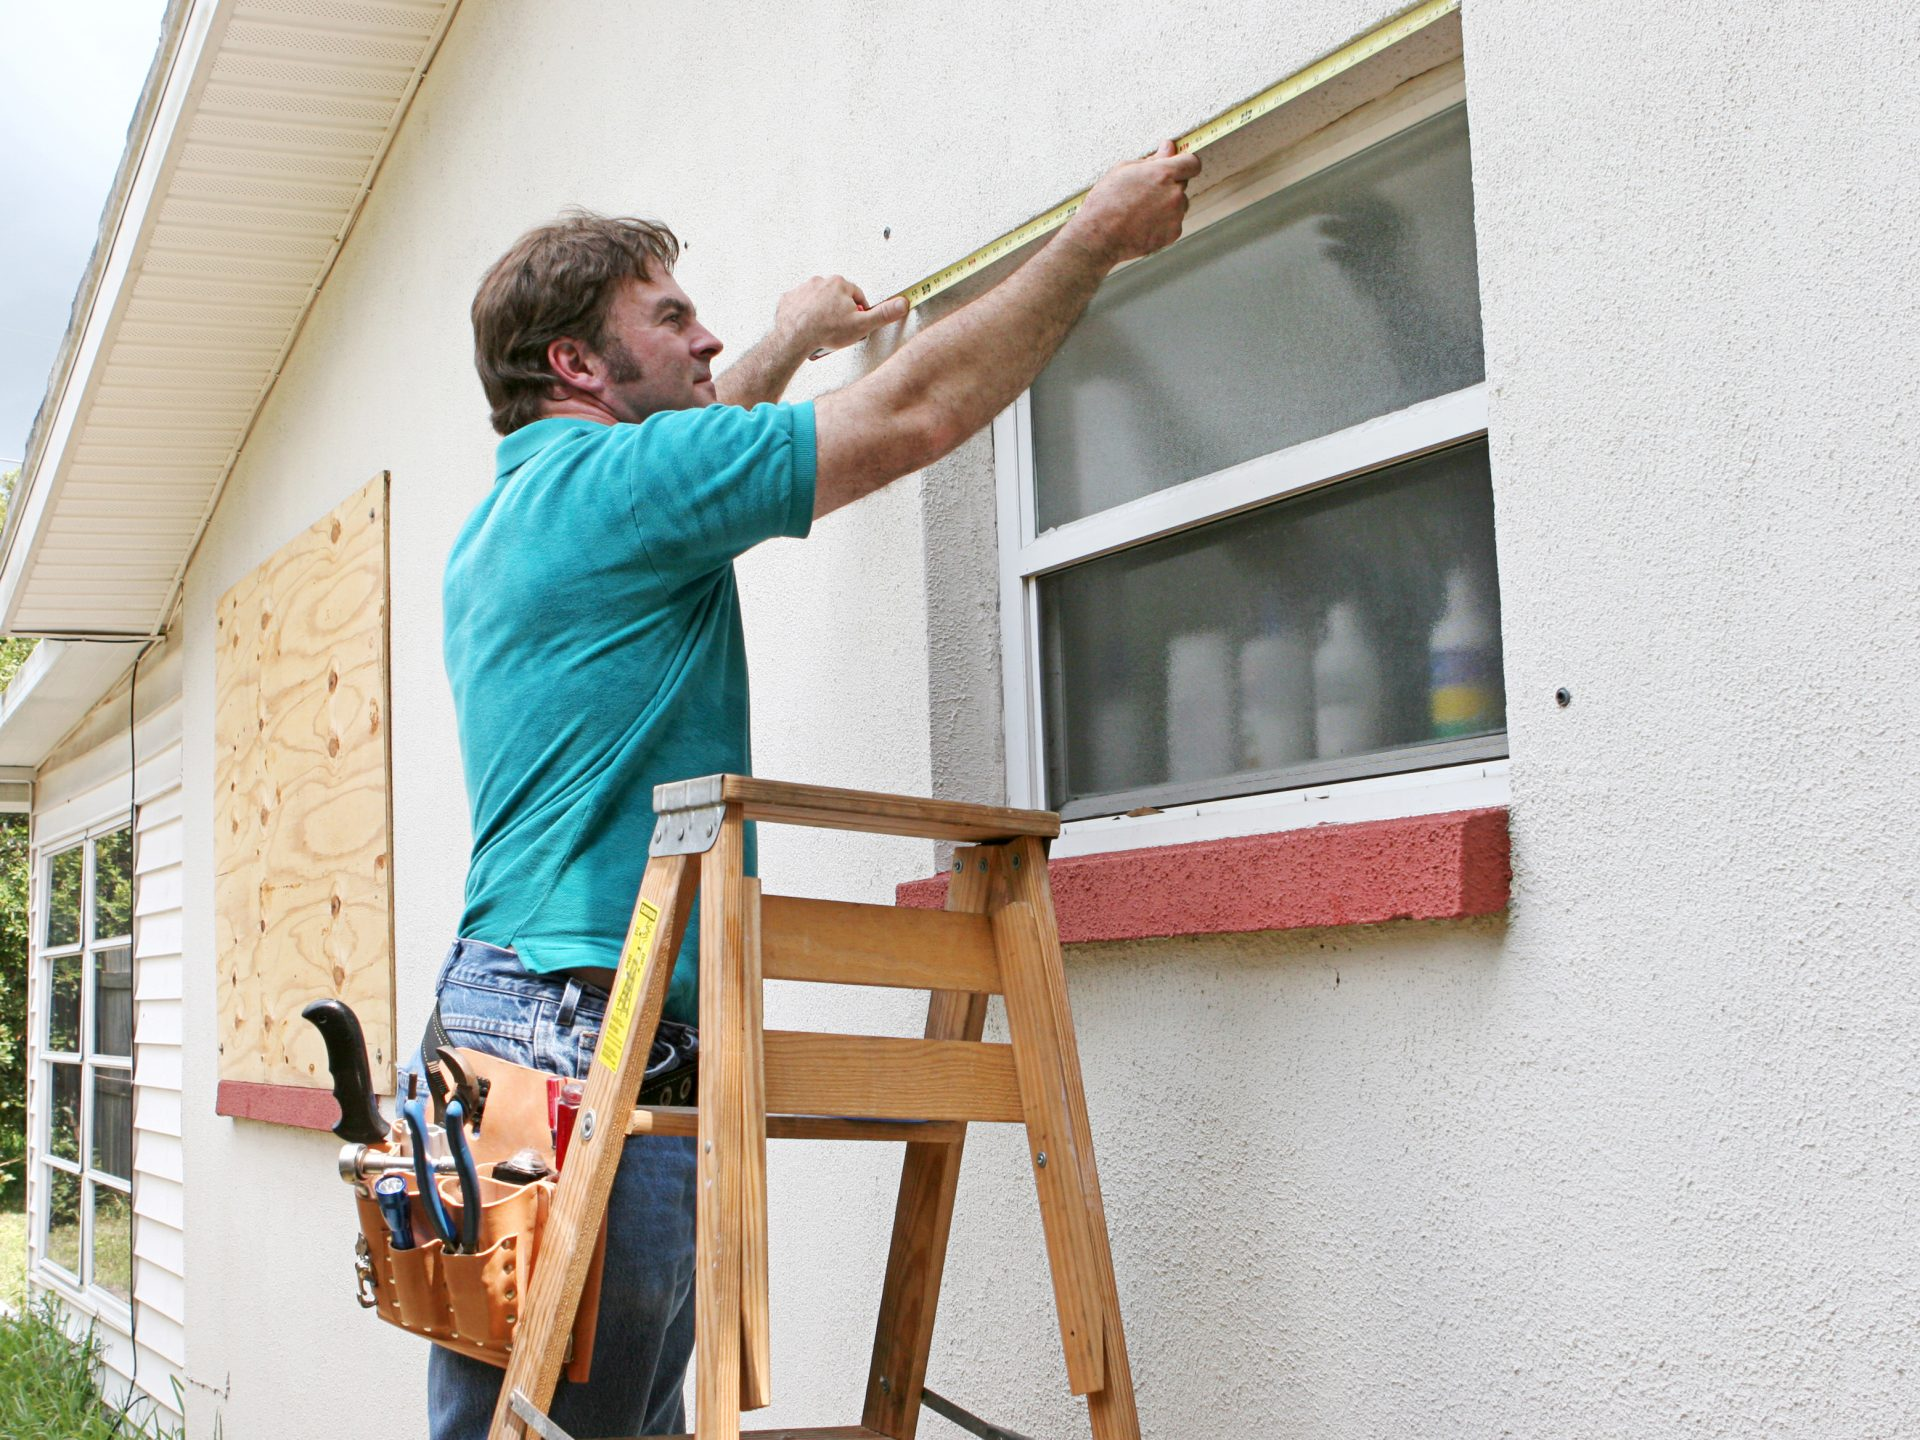 Hurricane preparedness with shutters